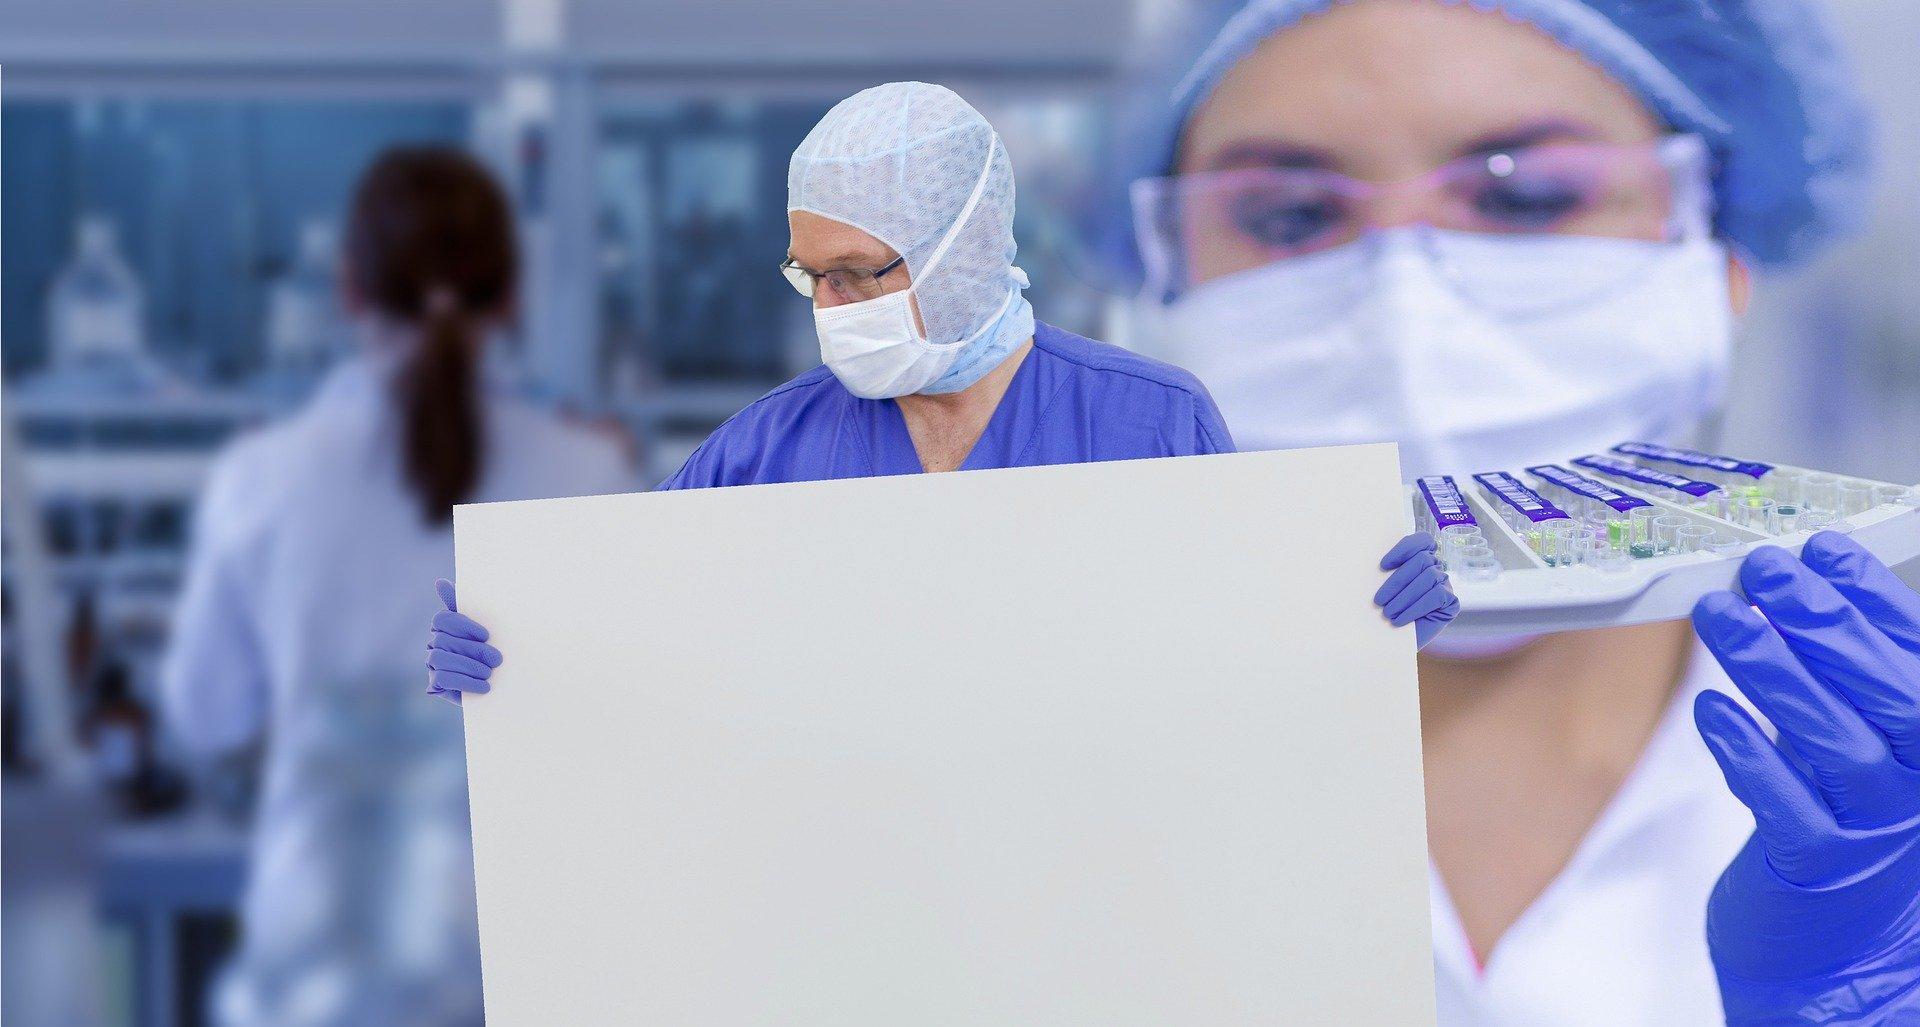 coronavirus, COVID-19, doctors, nurses, healthcare professionals,